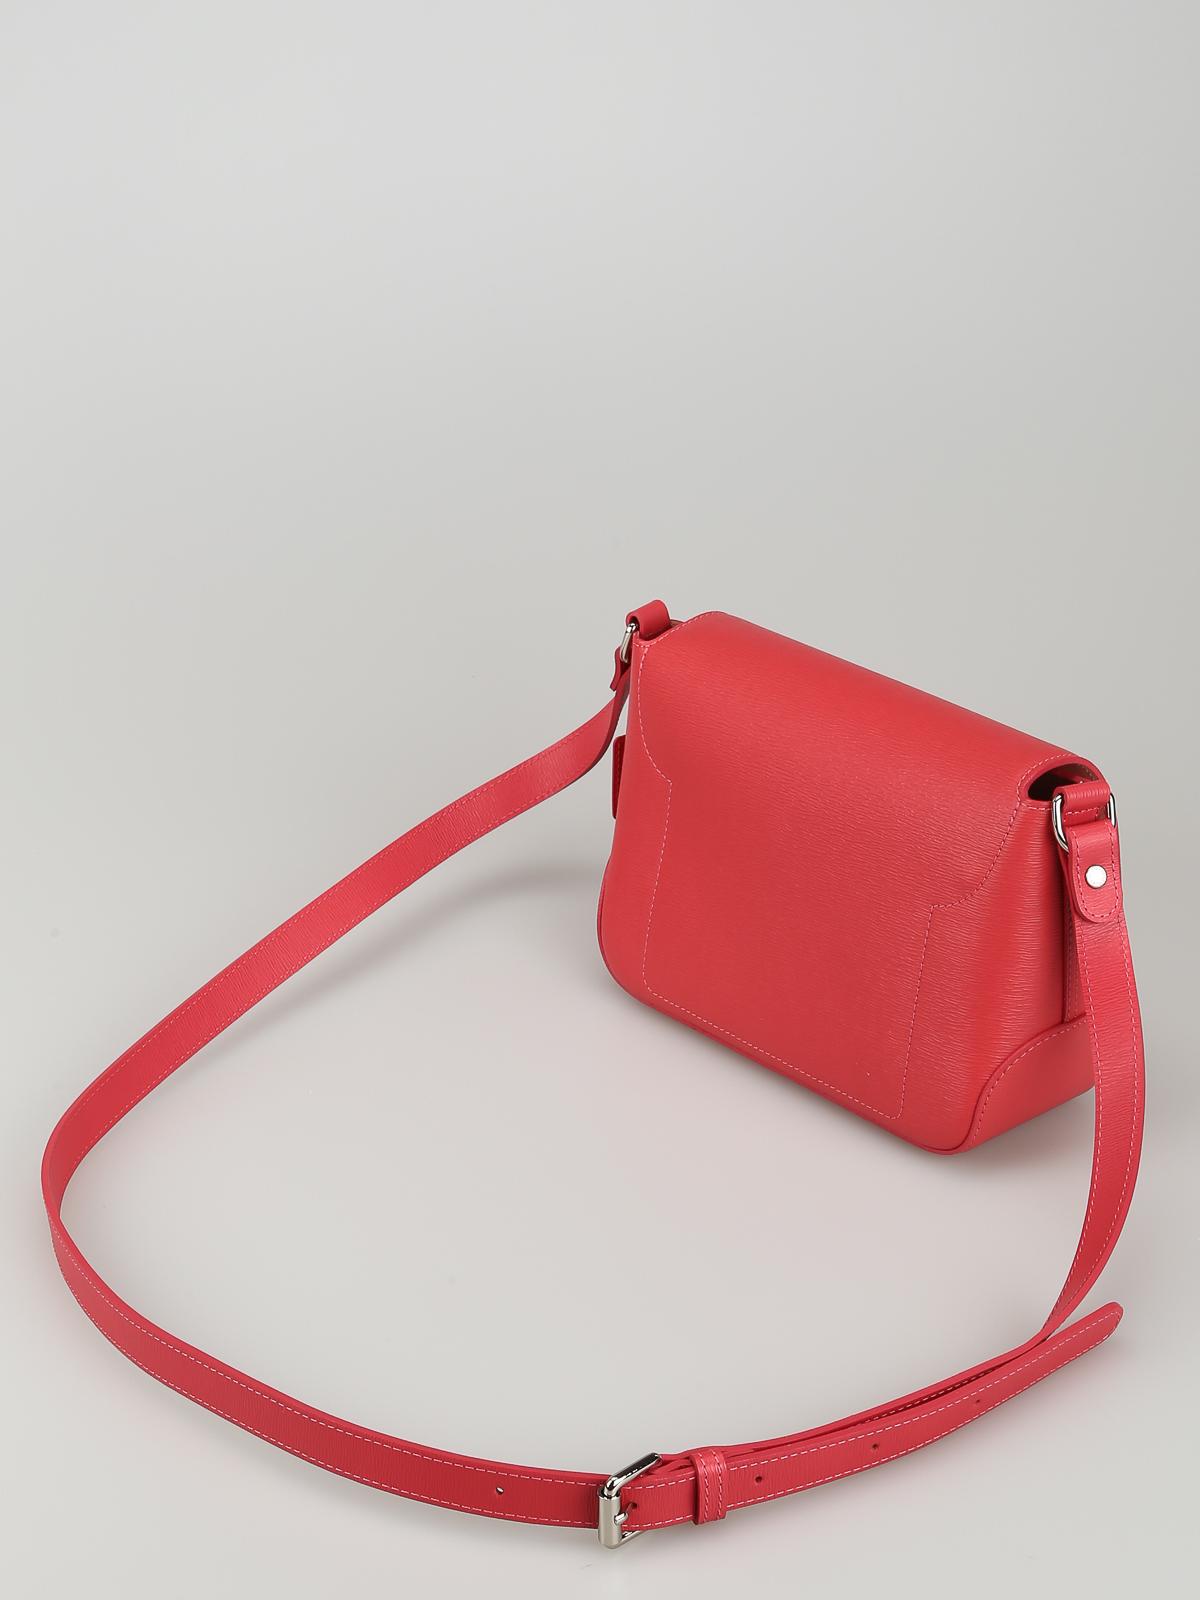 Longchamp Bolsa Bandolera Roseau Bolsas bandoleras